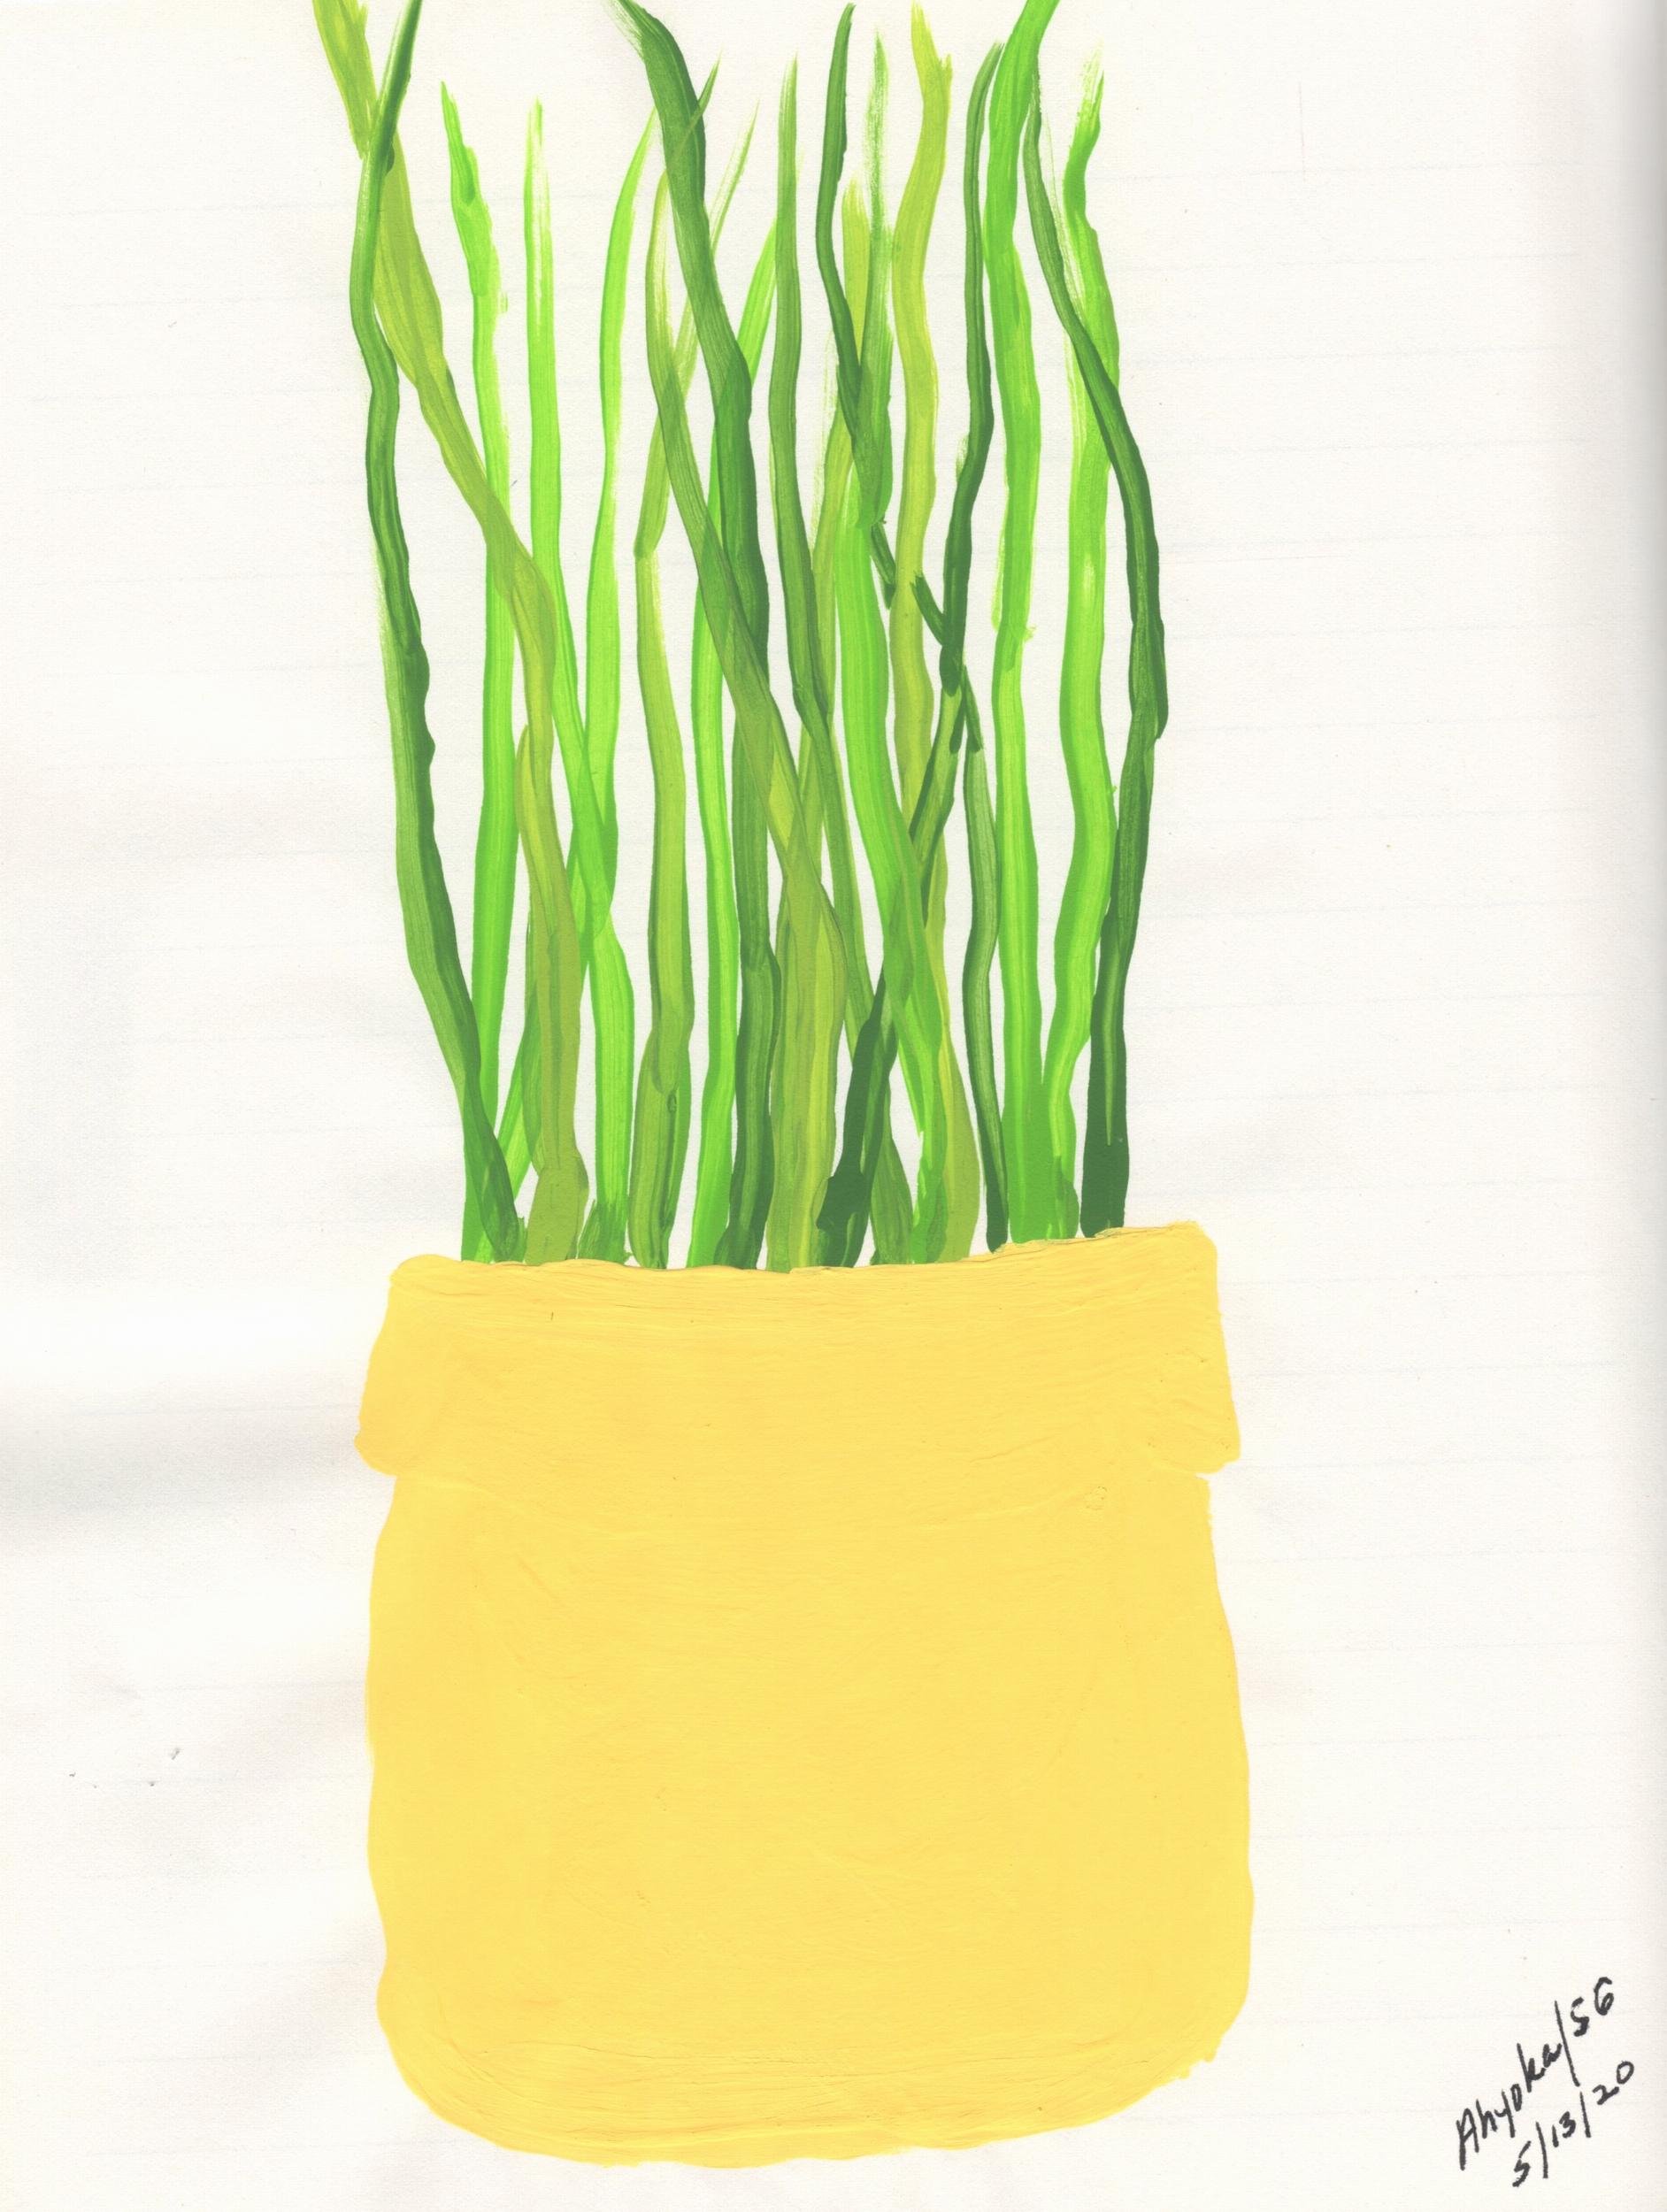 GREEN STALKS